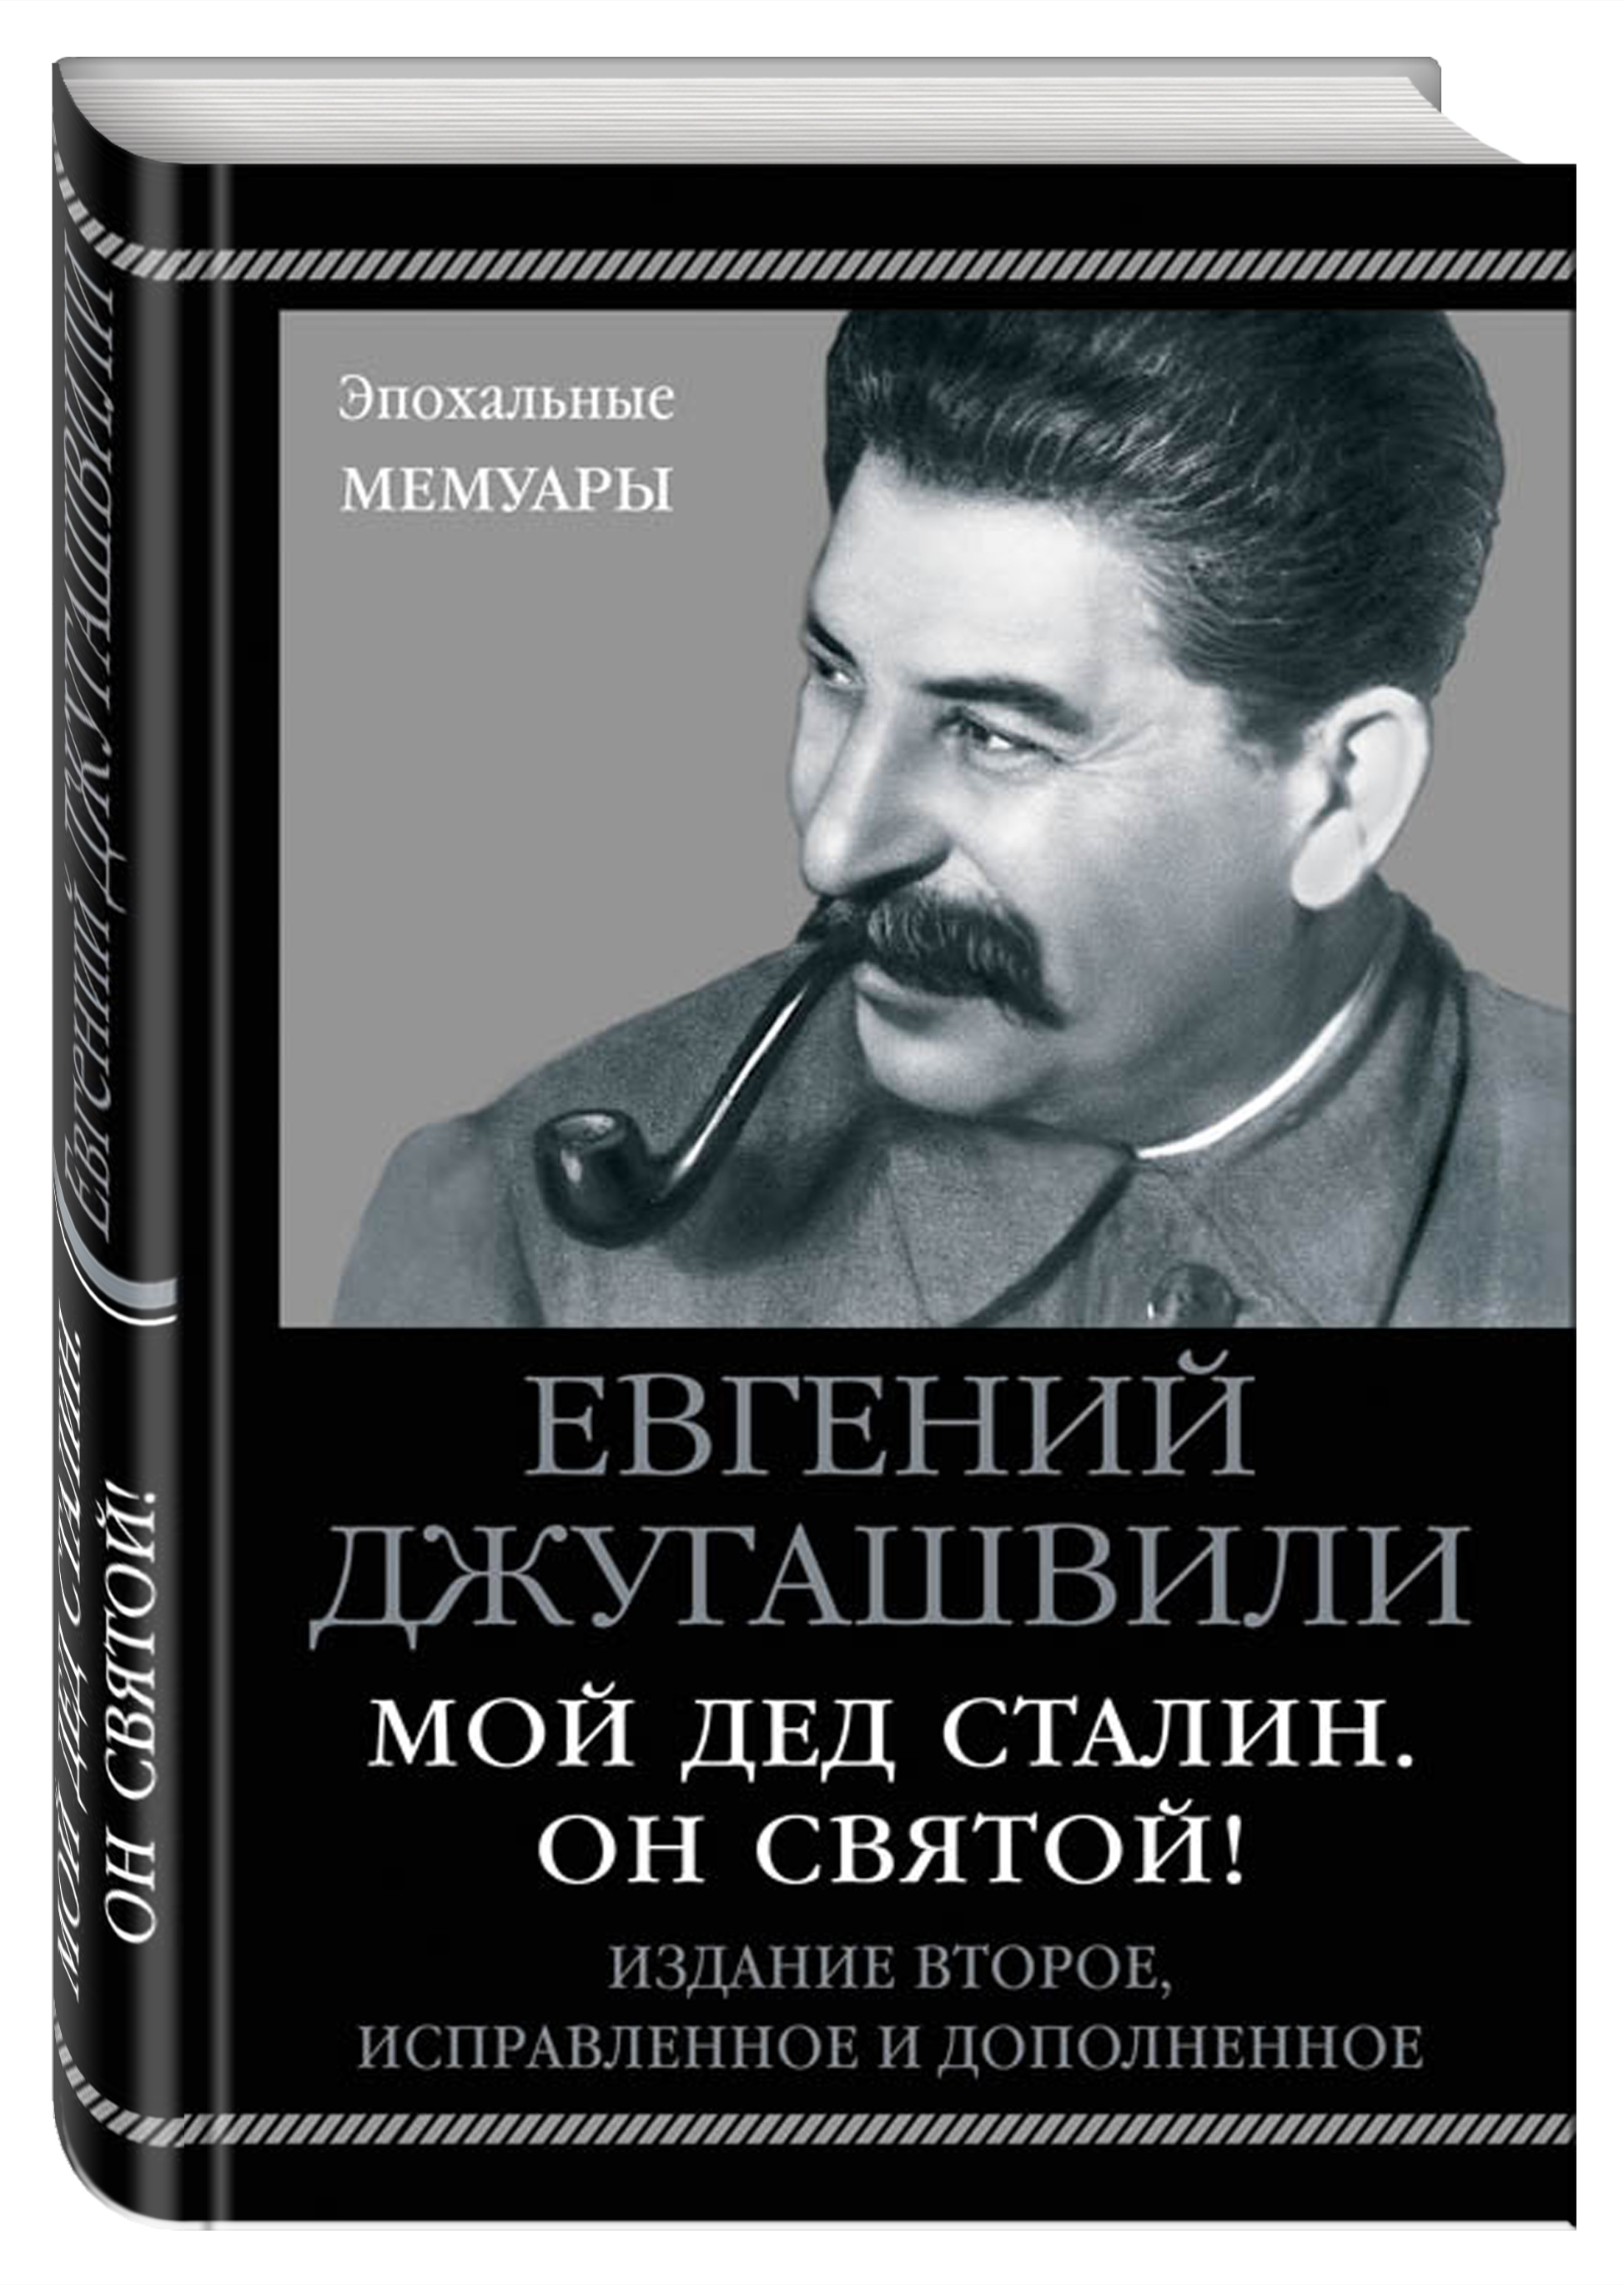 Джугашвили Е.Я. Мой дед Сталин. Он святой! плигина я ред мемуары матери сталина 13 женщин джугашвили